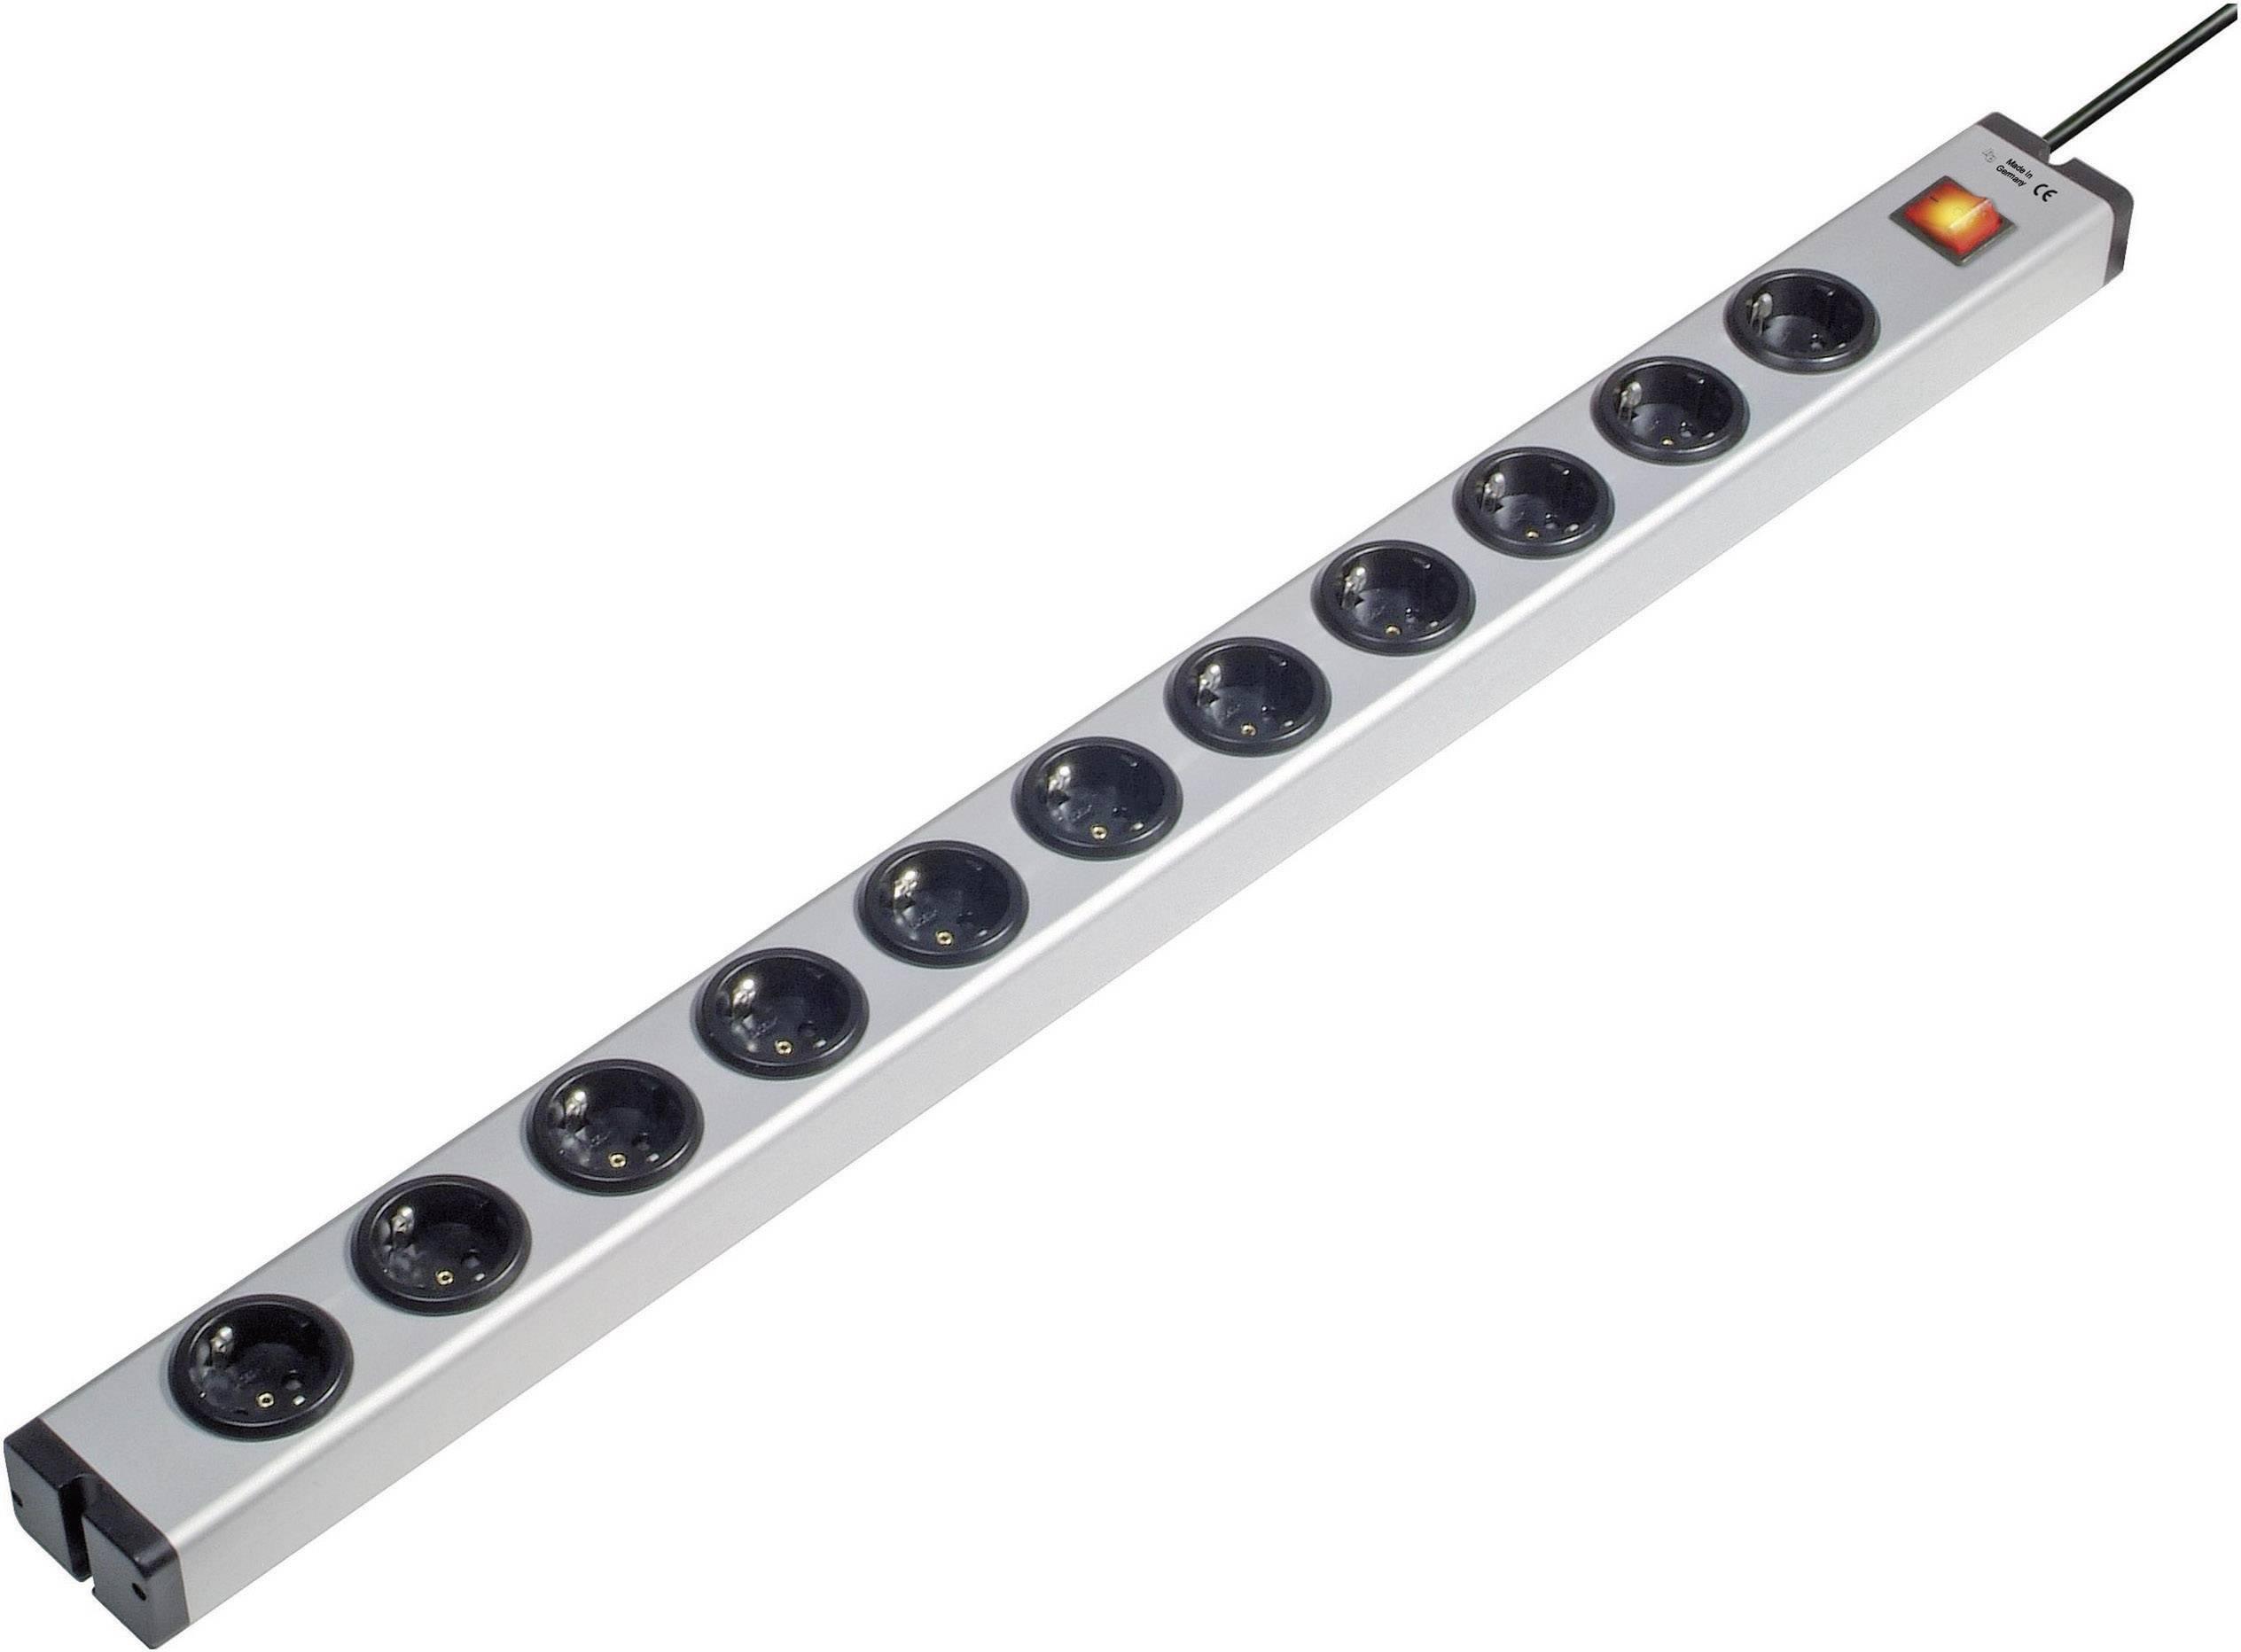 Zásuvková lišta Ehmann se spínačem, 11 zásuvek, 1,5m kabel